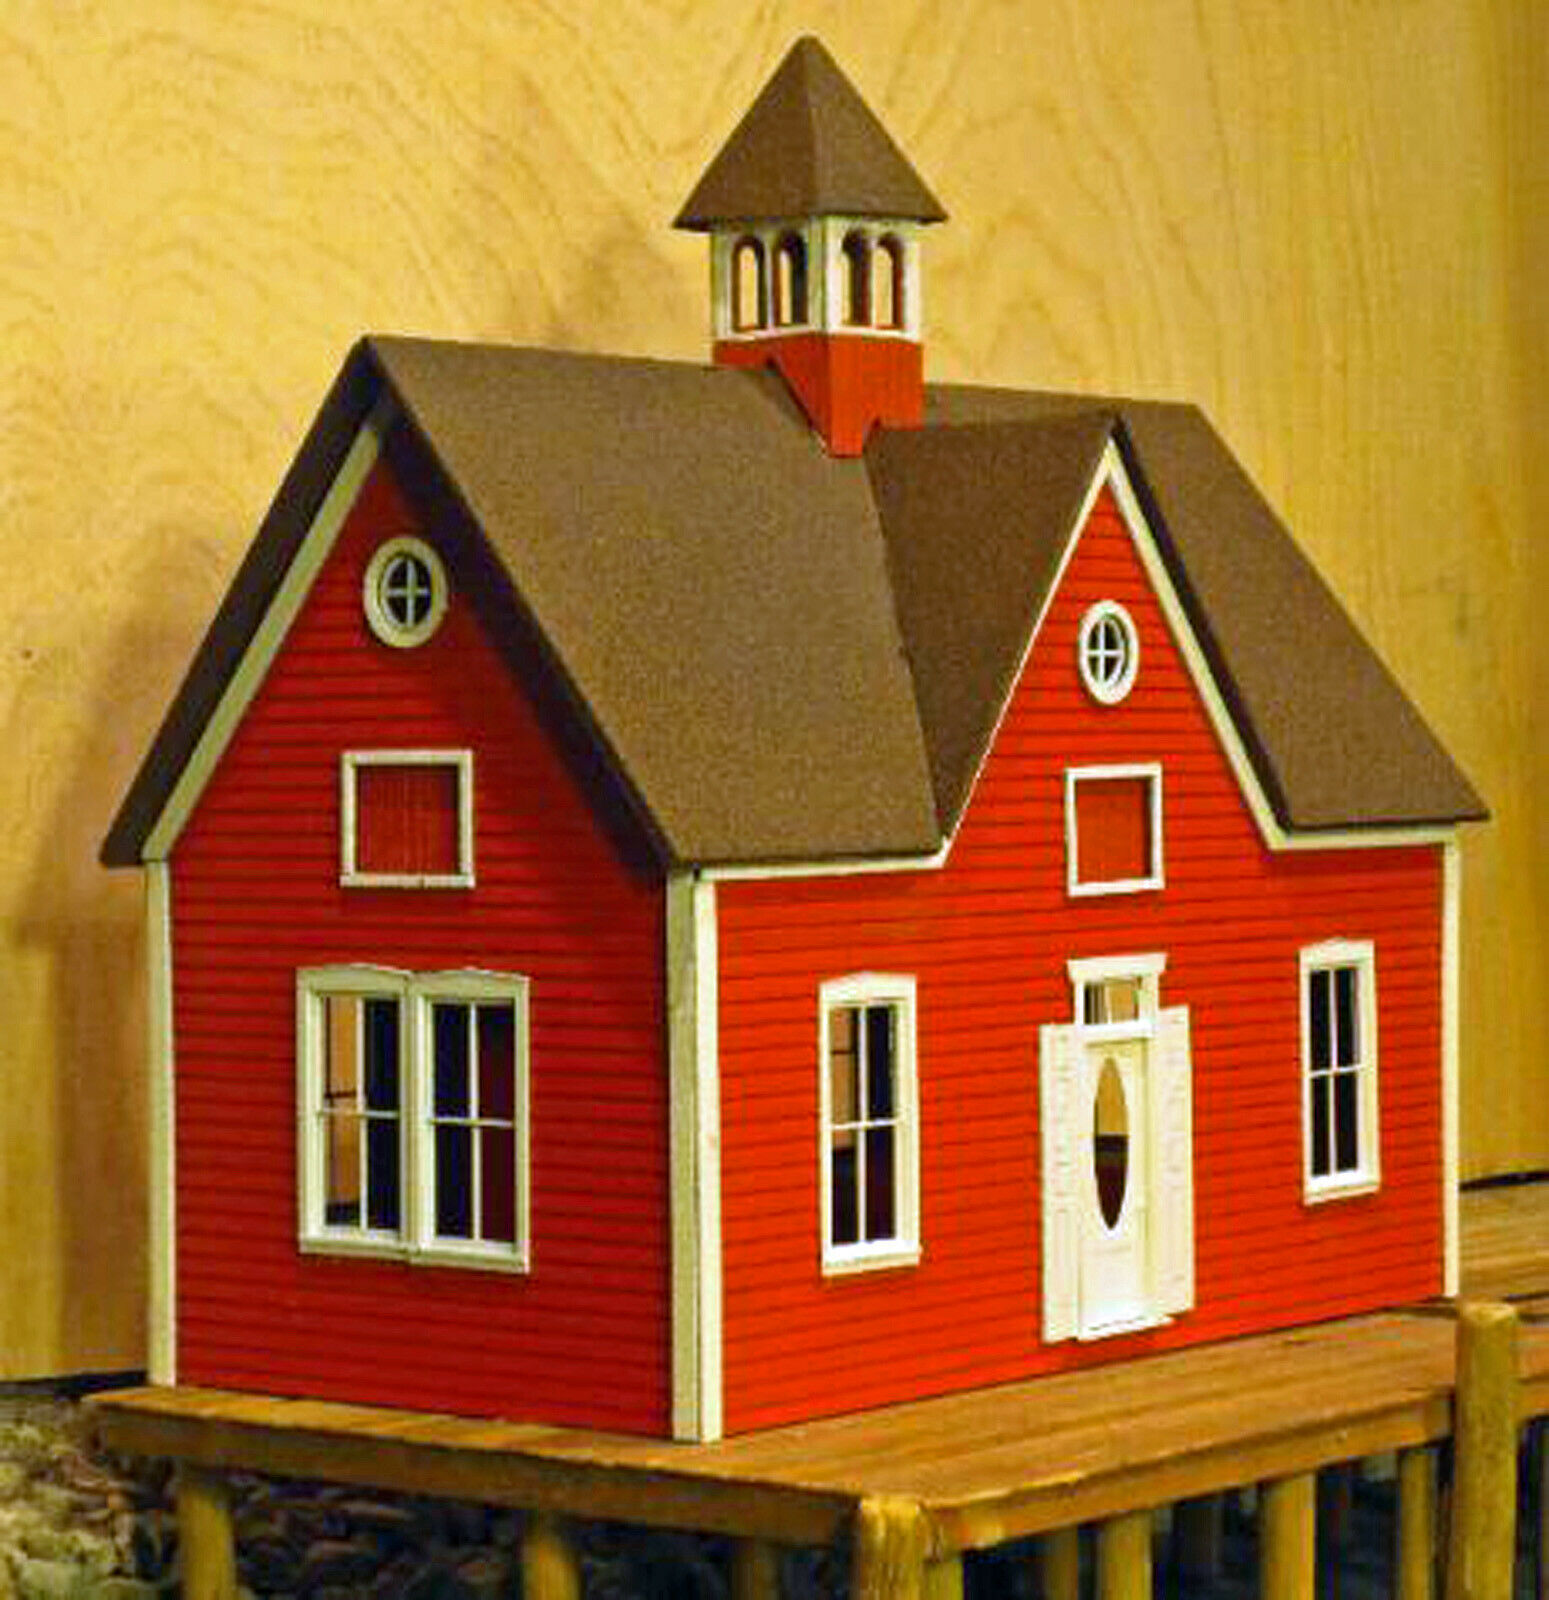 CARRIAGE HOUSE FOUR FOUR FOUR PANE WINDOWS O On30 Model Railroad Unptd Laser Kit DF421B ab2184